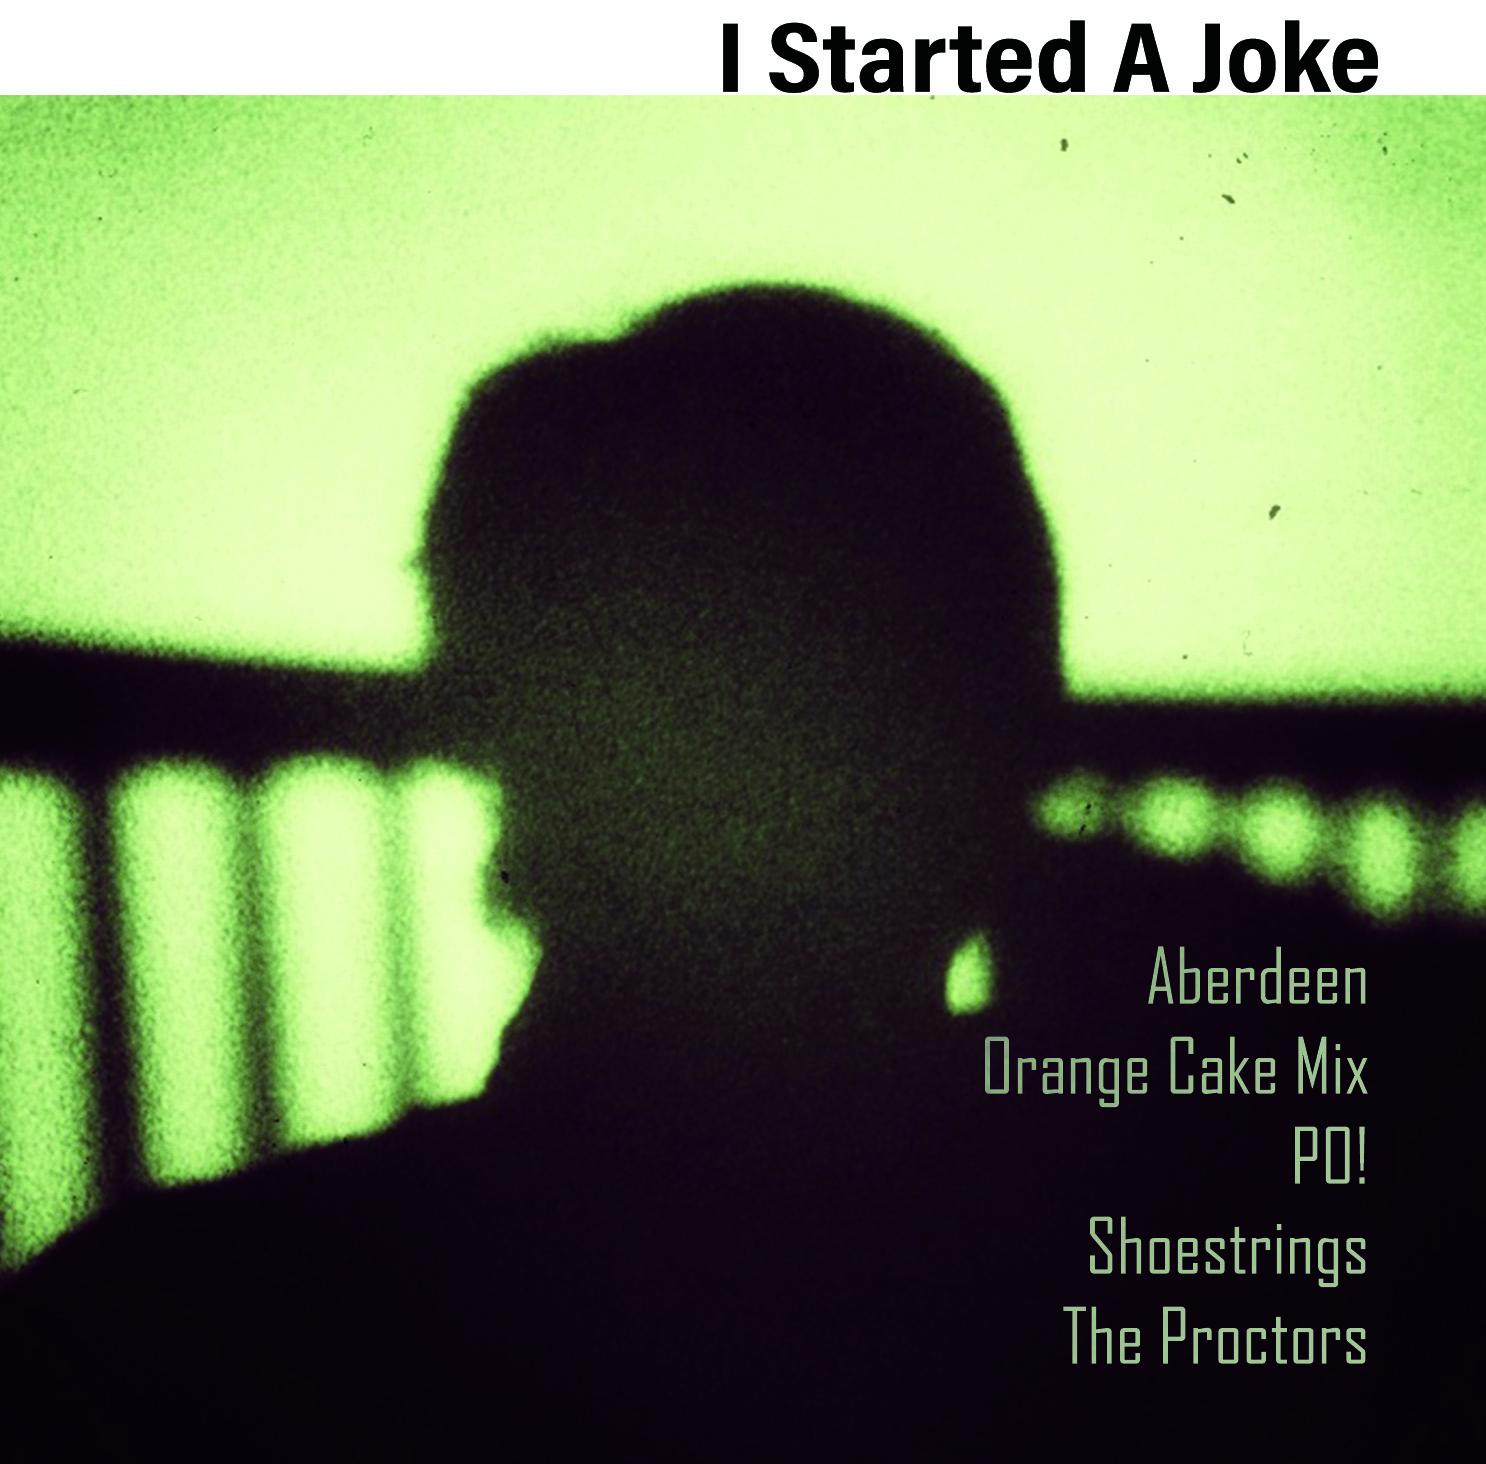 I Started A Joke - A Sunday Records Compilation CD